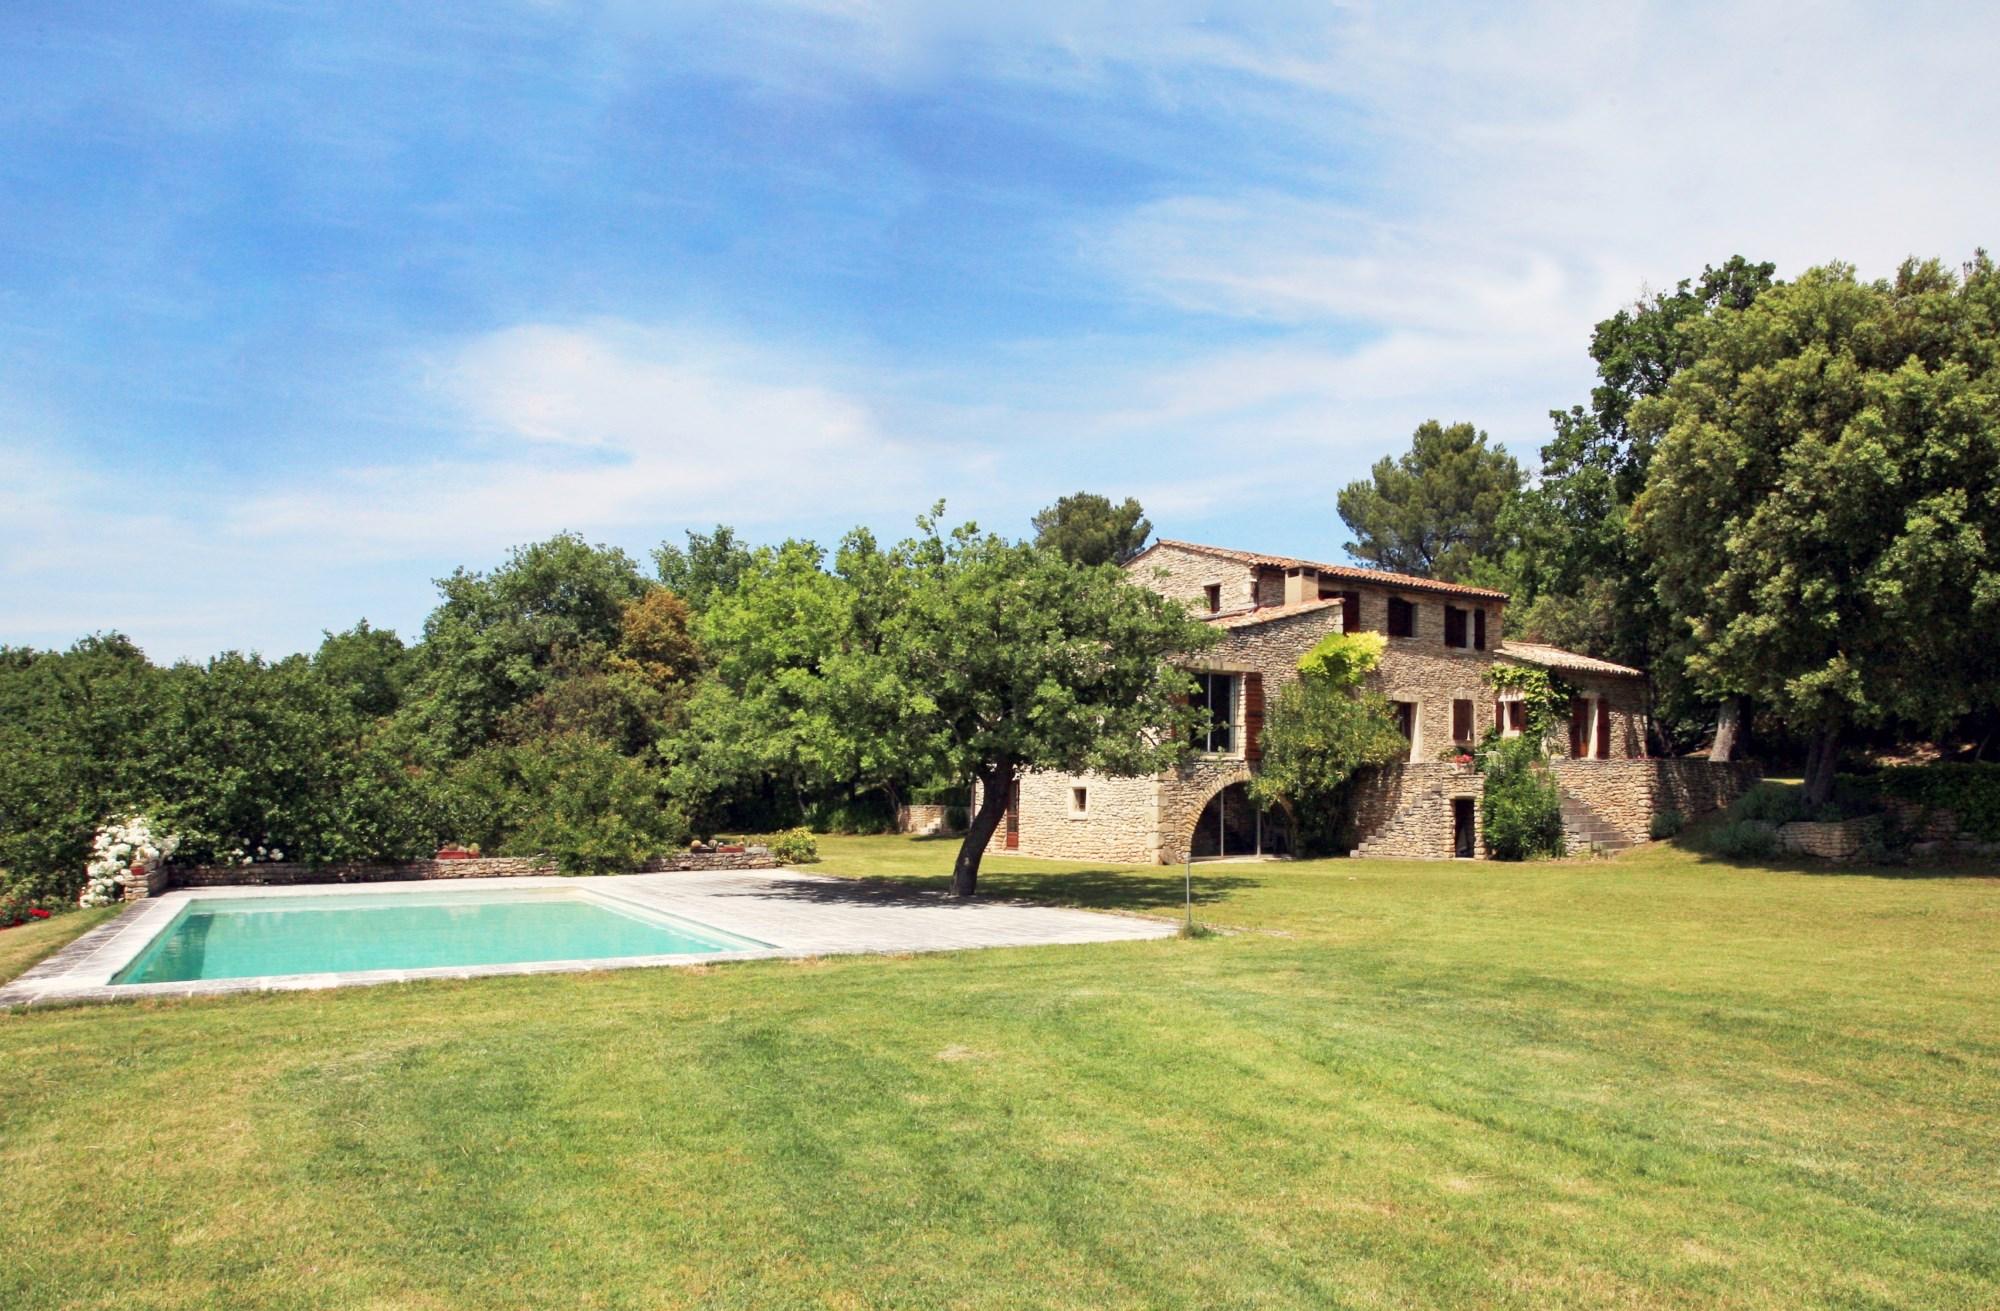 Maison en pierre avec piscine en Luberon